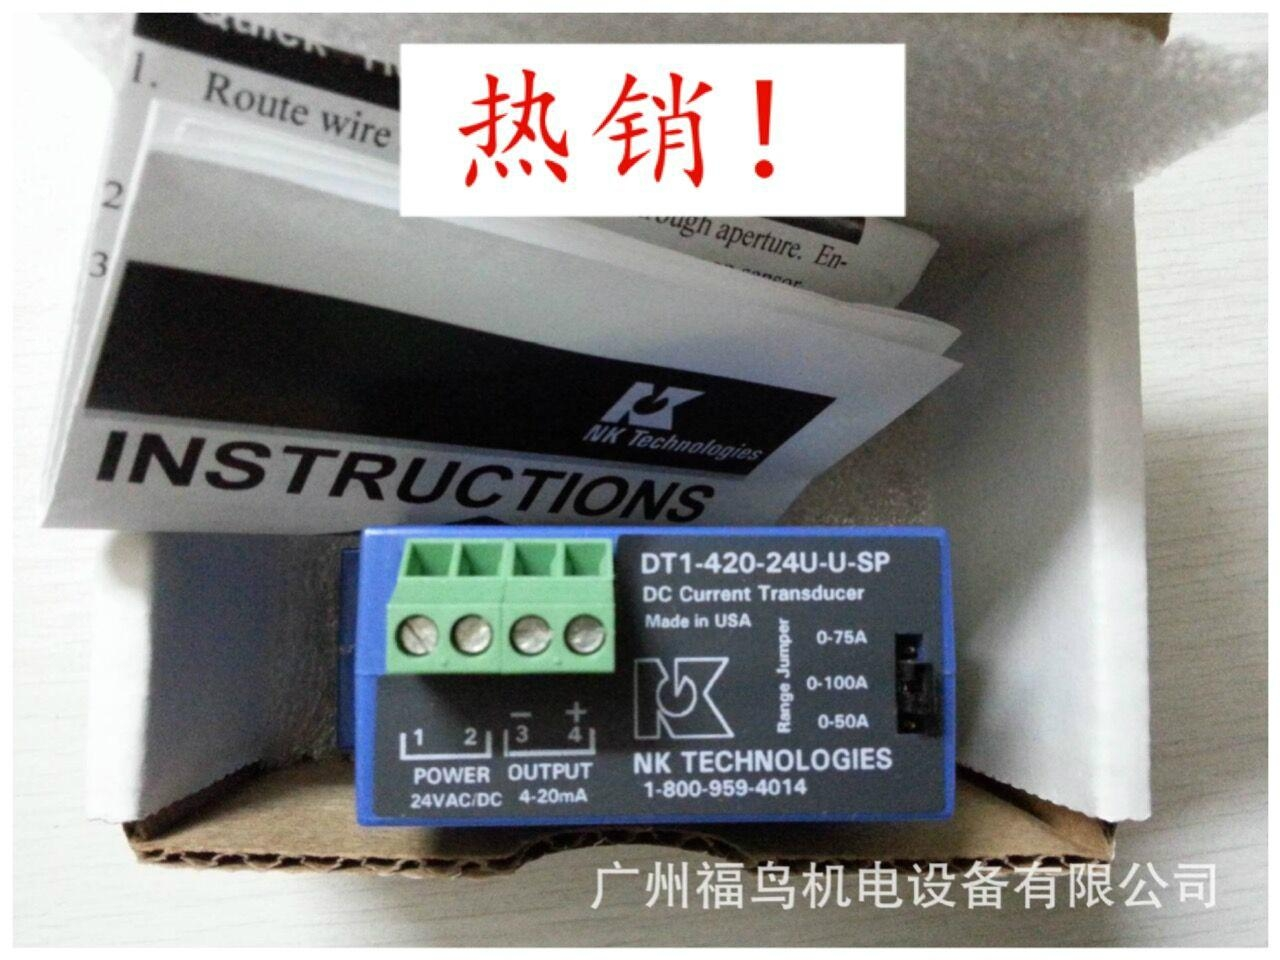 NK TECHNOLOGIES電流變送器, 型號: DT1-420-24U-U-SP